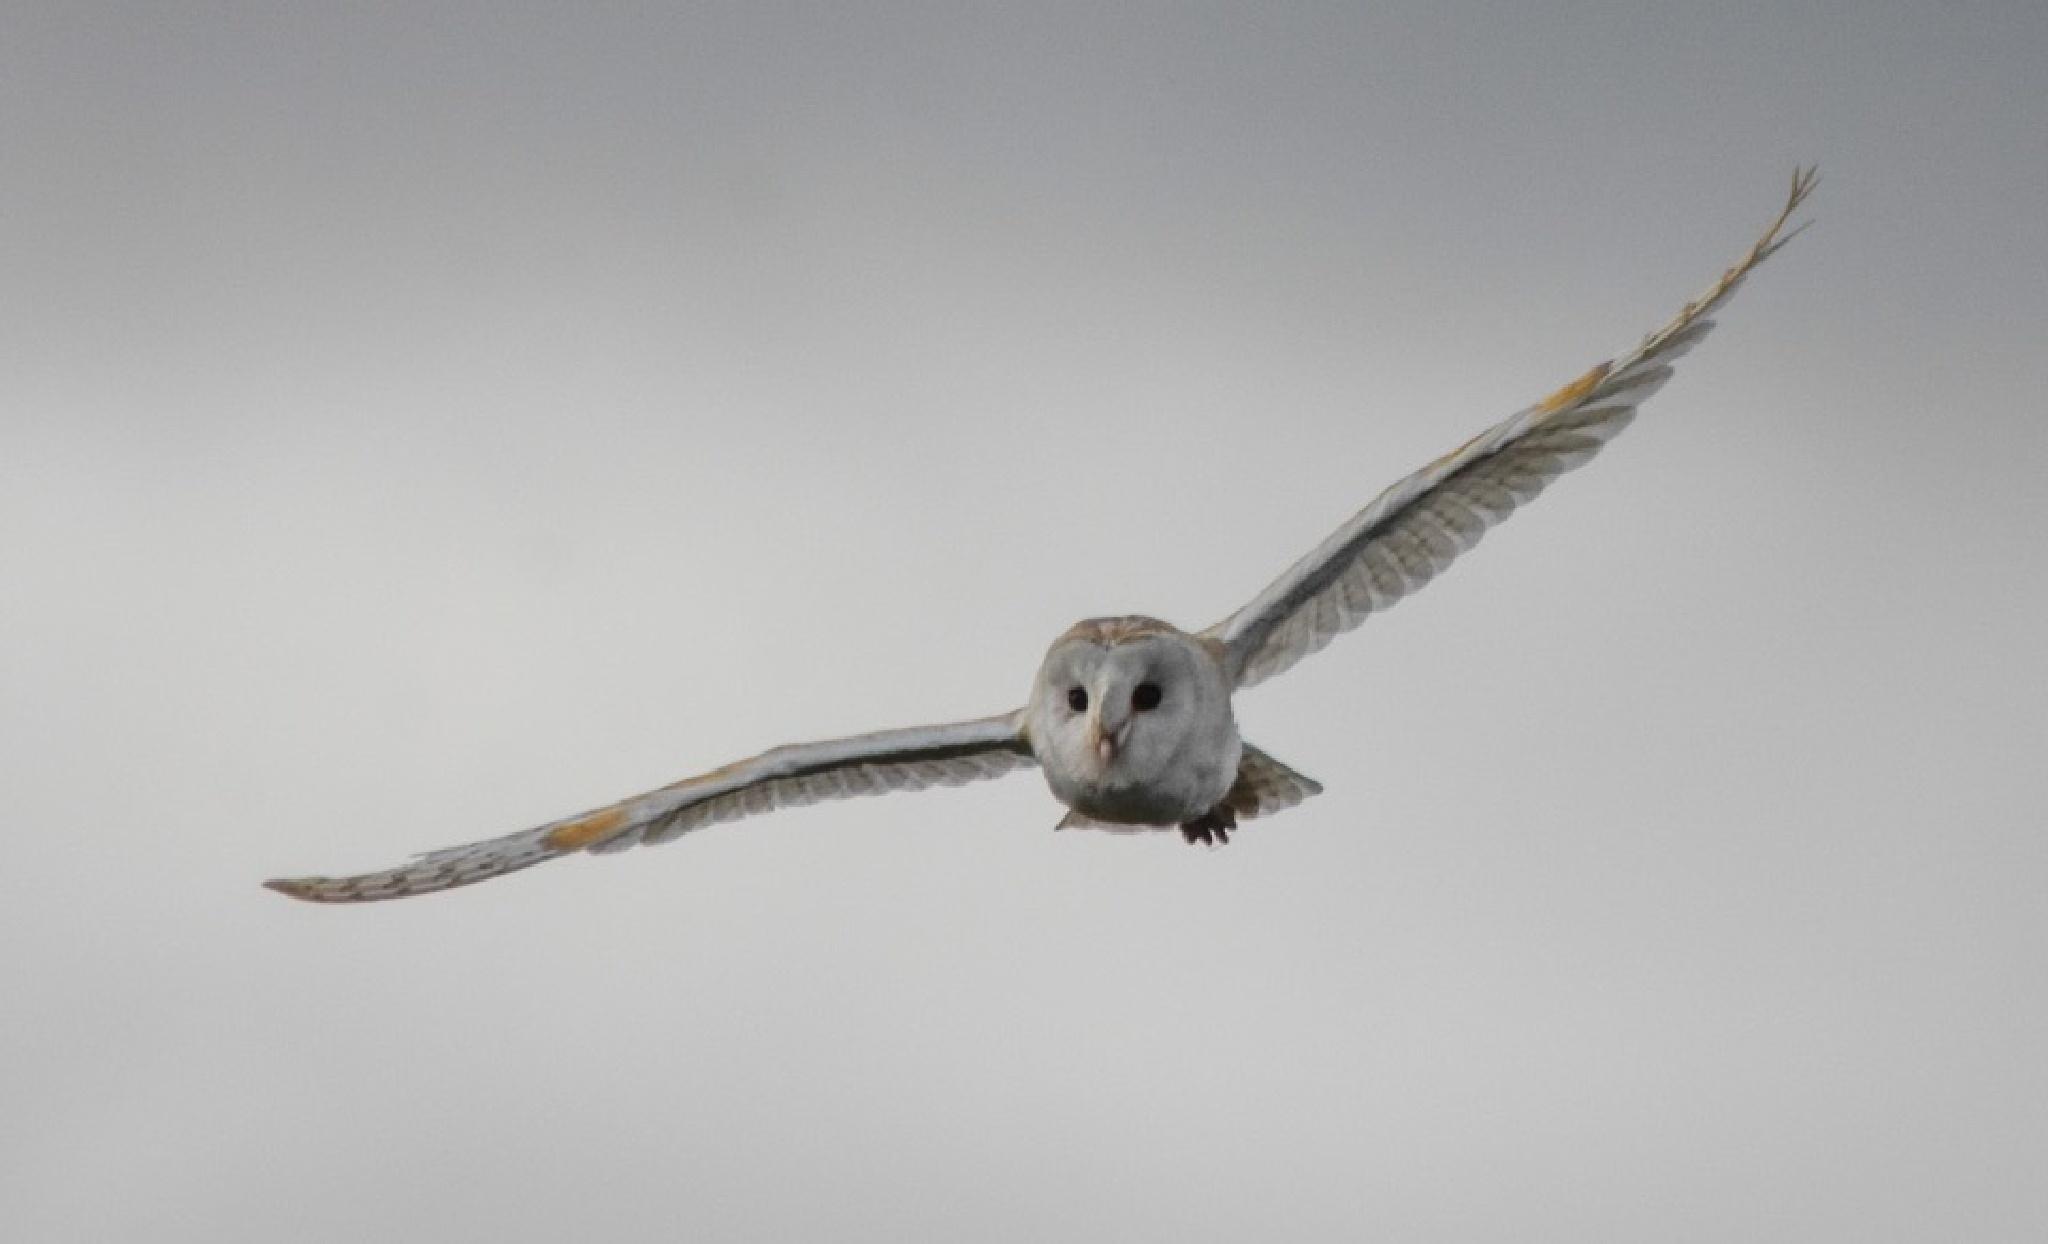 Barn Owl by gazclarke1974